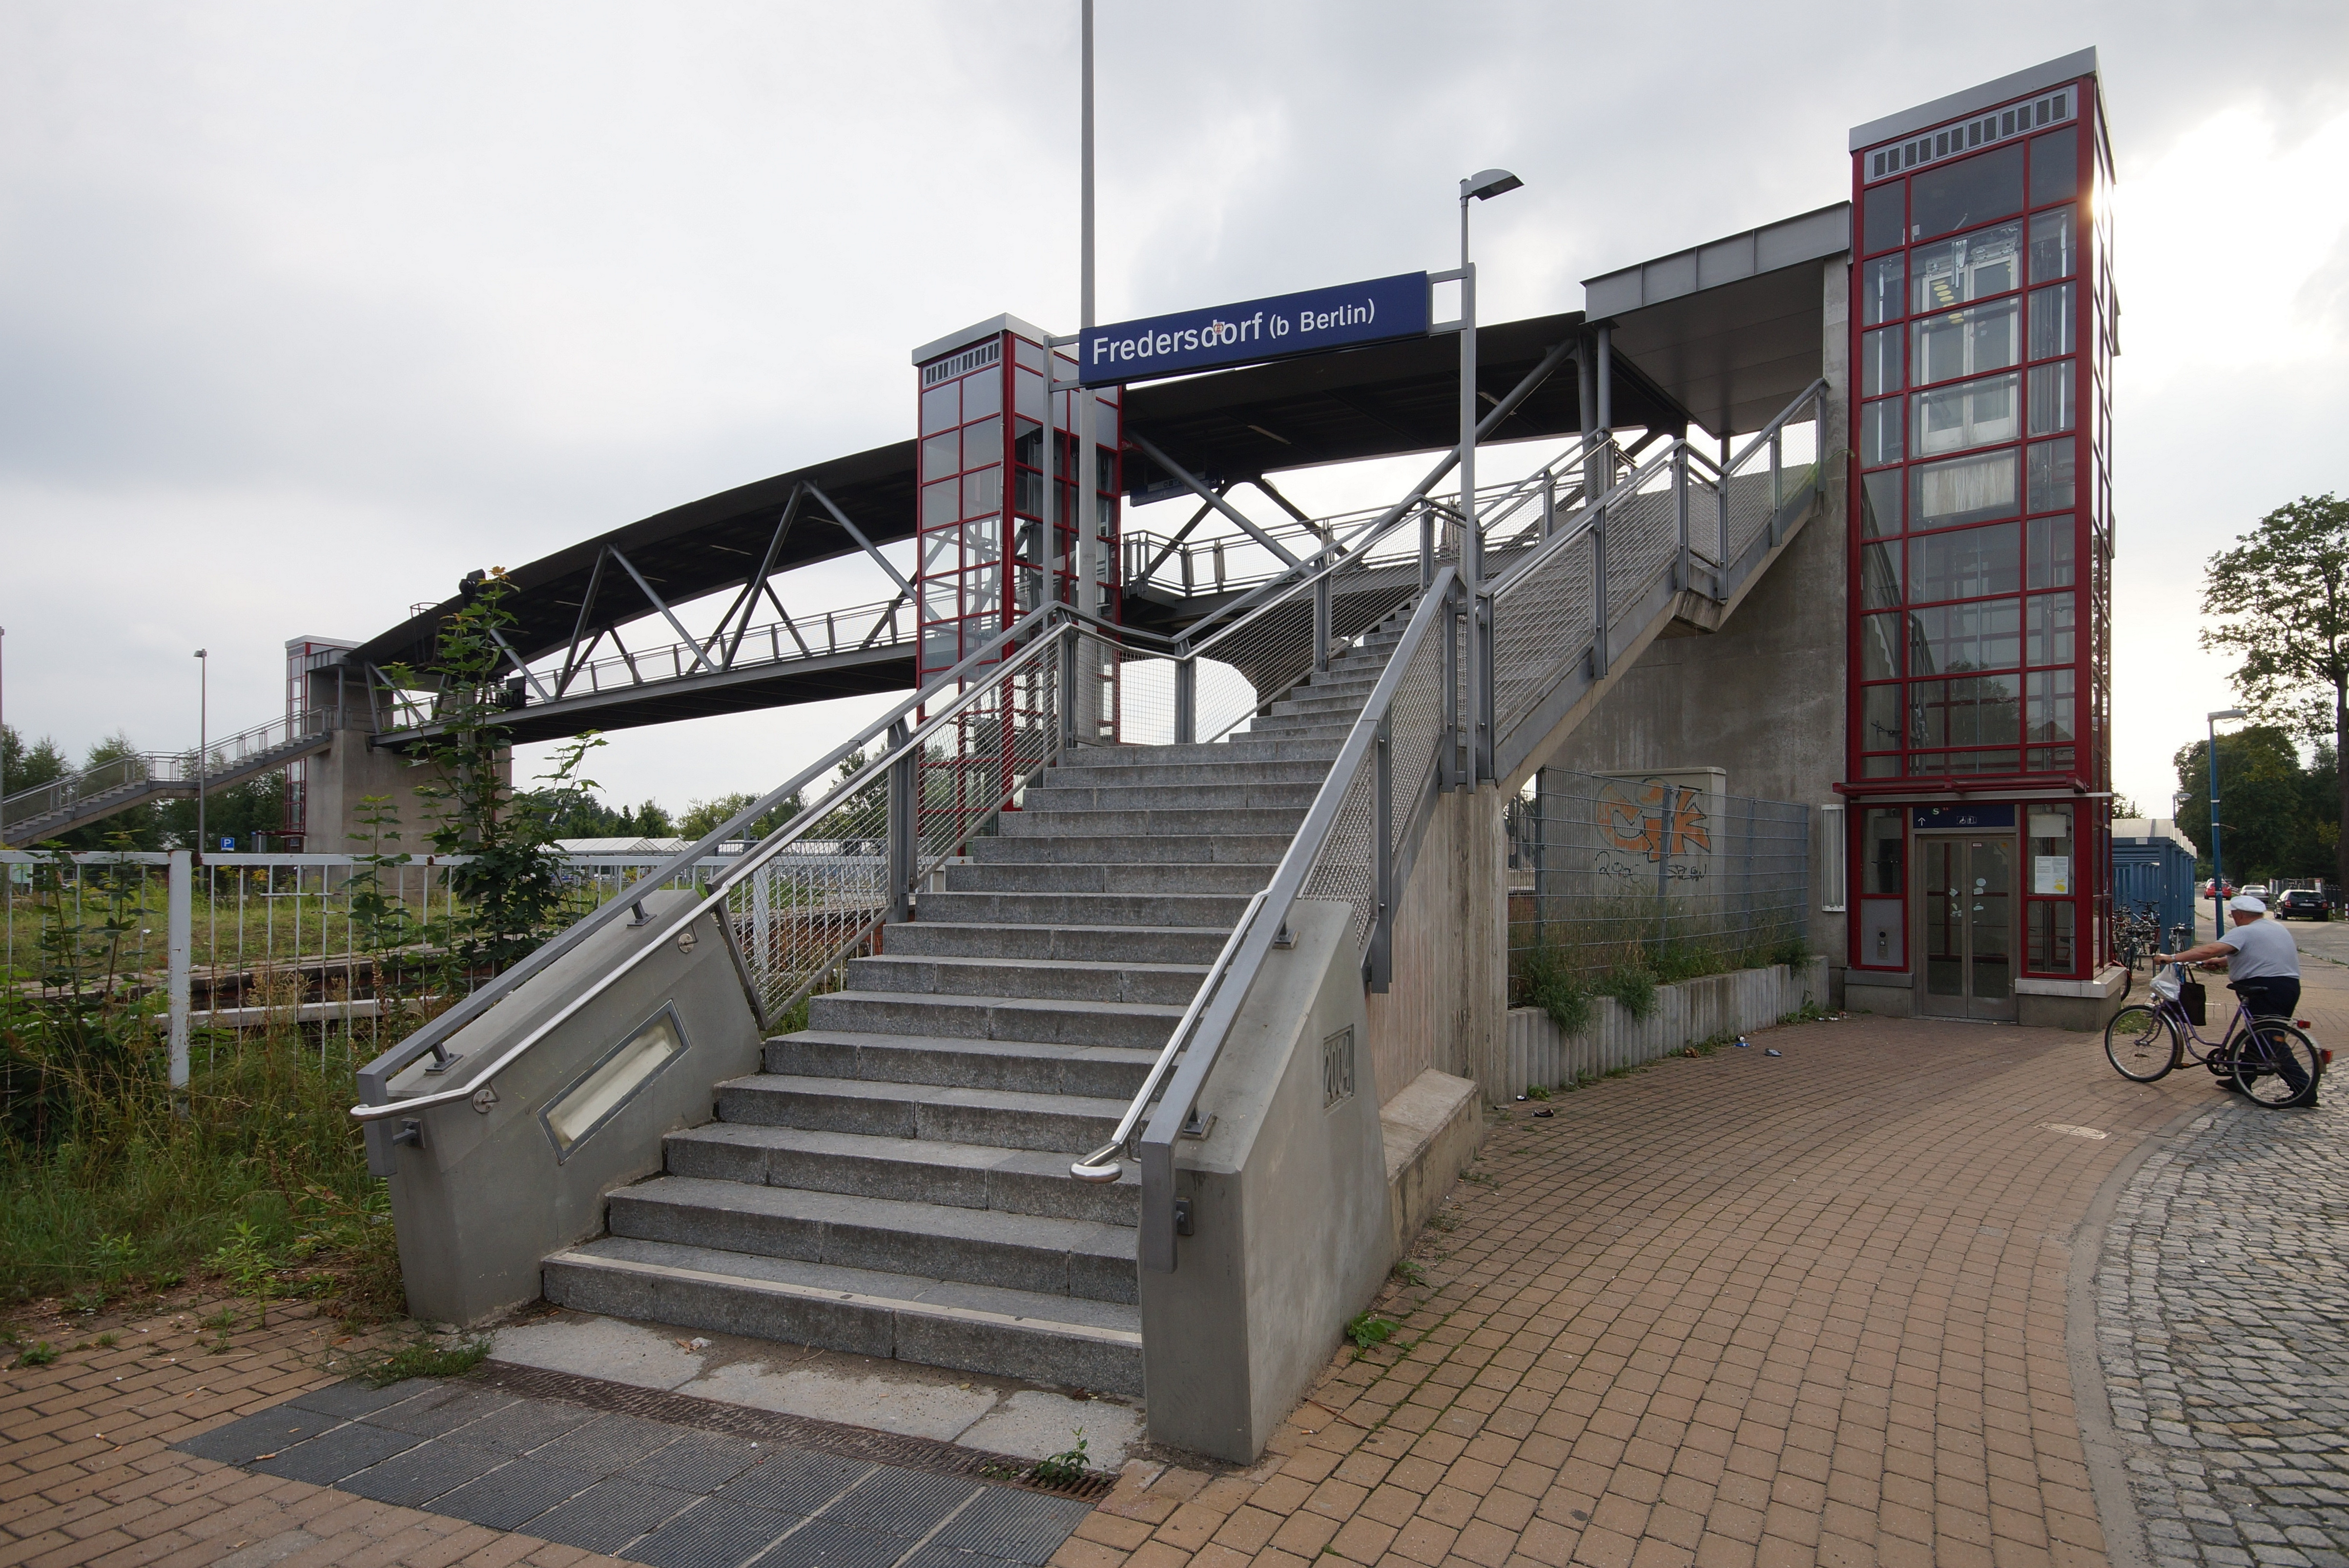 Fredersdorf-Vogelsdorf